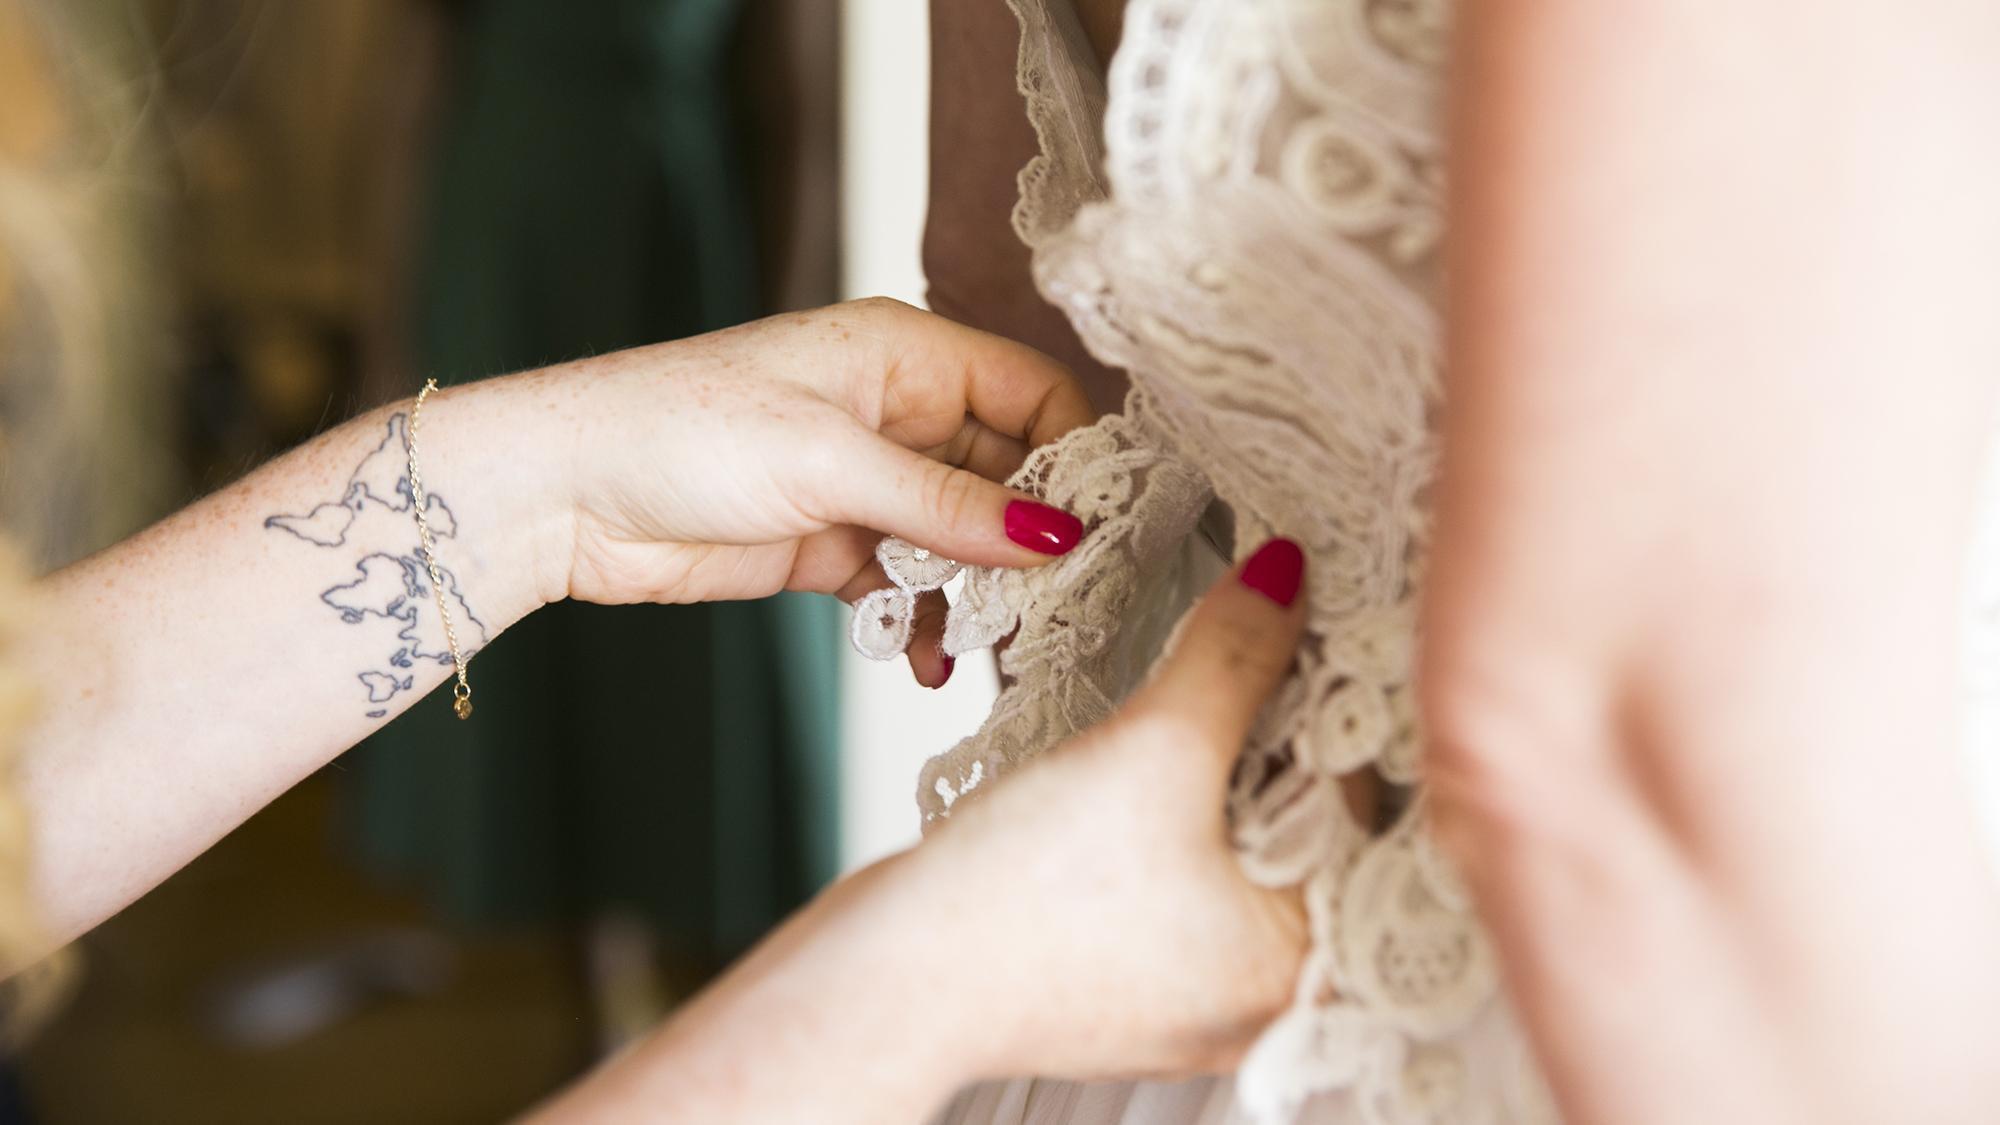 cernobbio_wedding_photo_0007